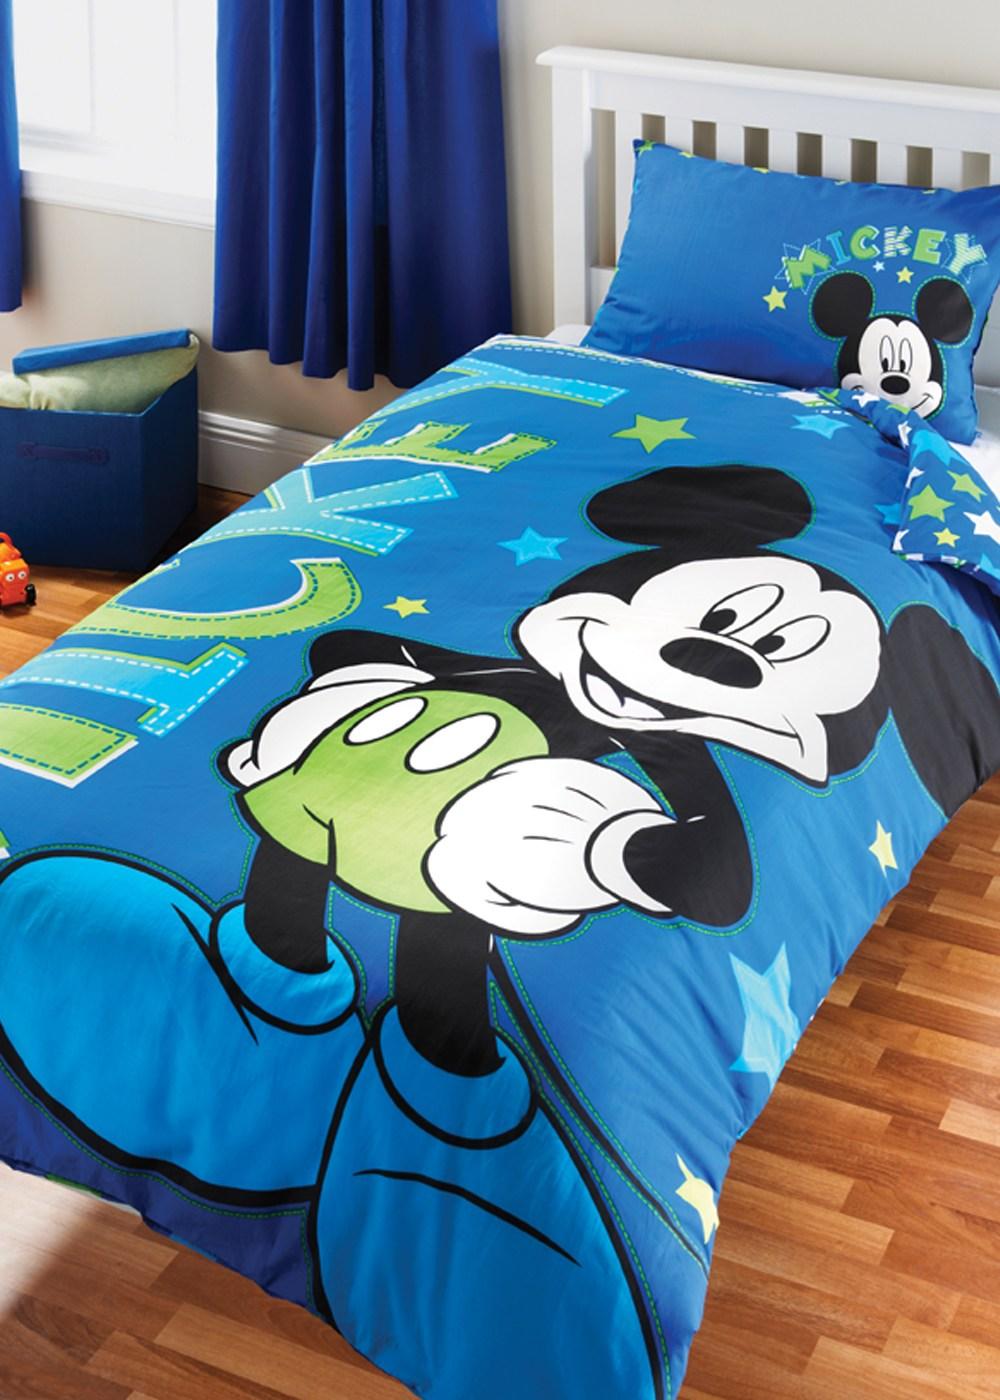 Mickey Mouse Bedroom Decor Ideas   Mickey Mouse Bedroom Decor